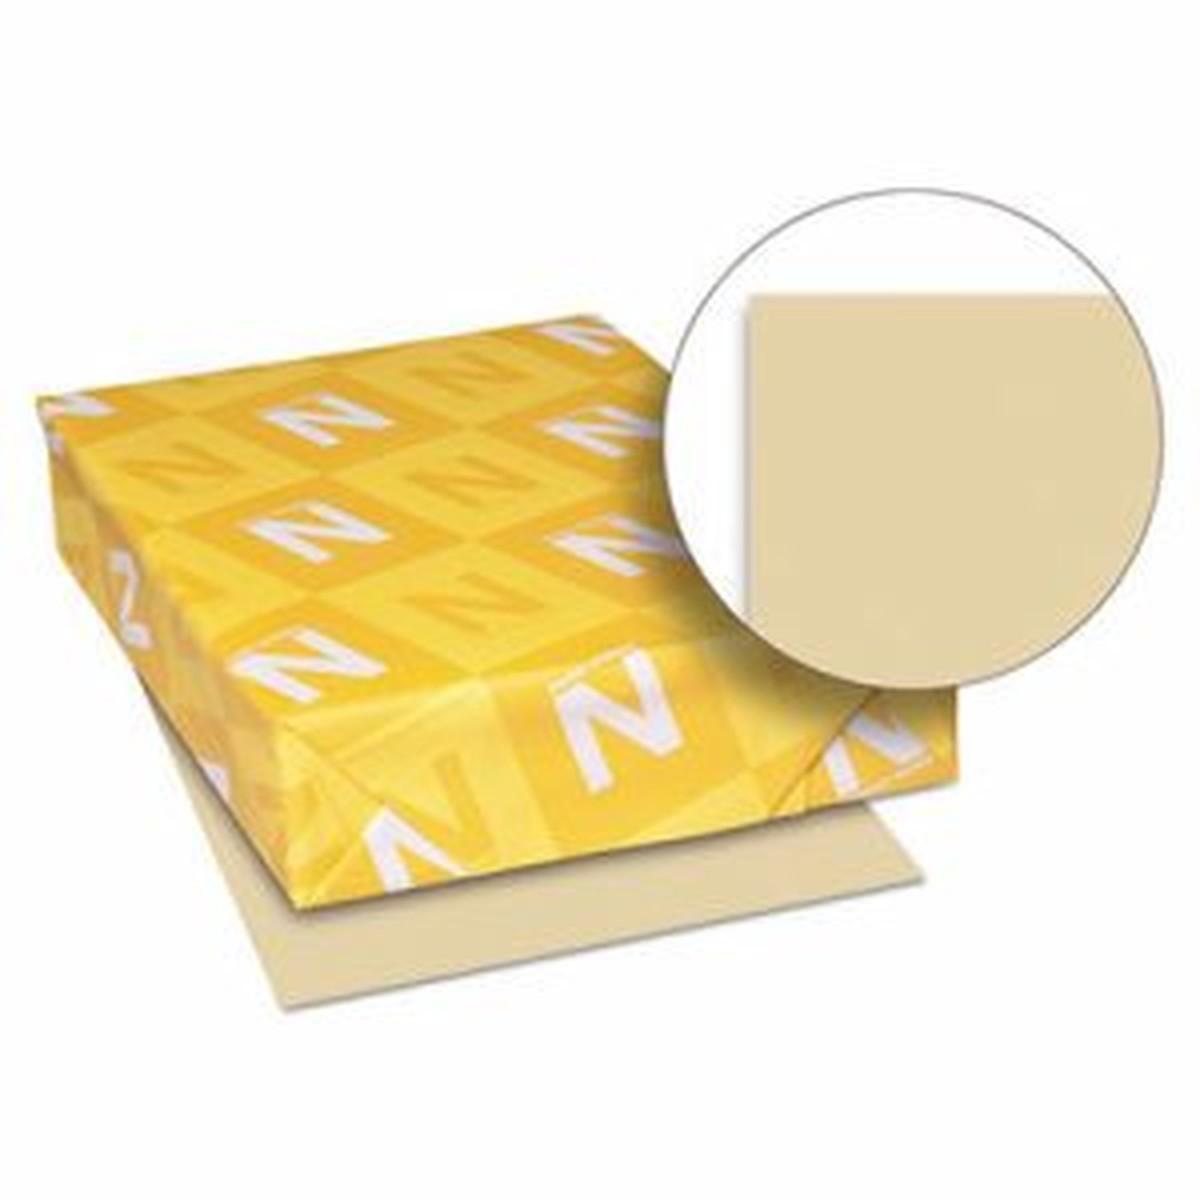 Exact Vellum Bristol Cover Stock, 67lb, 8 1/2 x 11, Tan, 250 Sheets